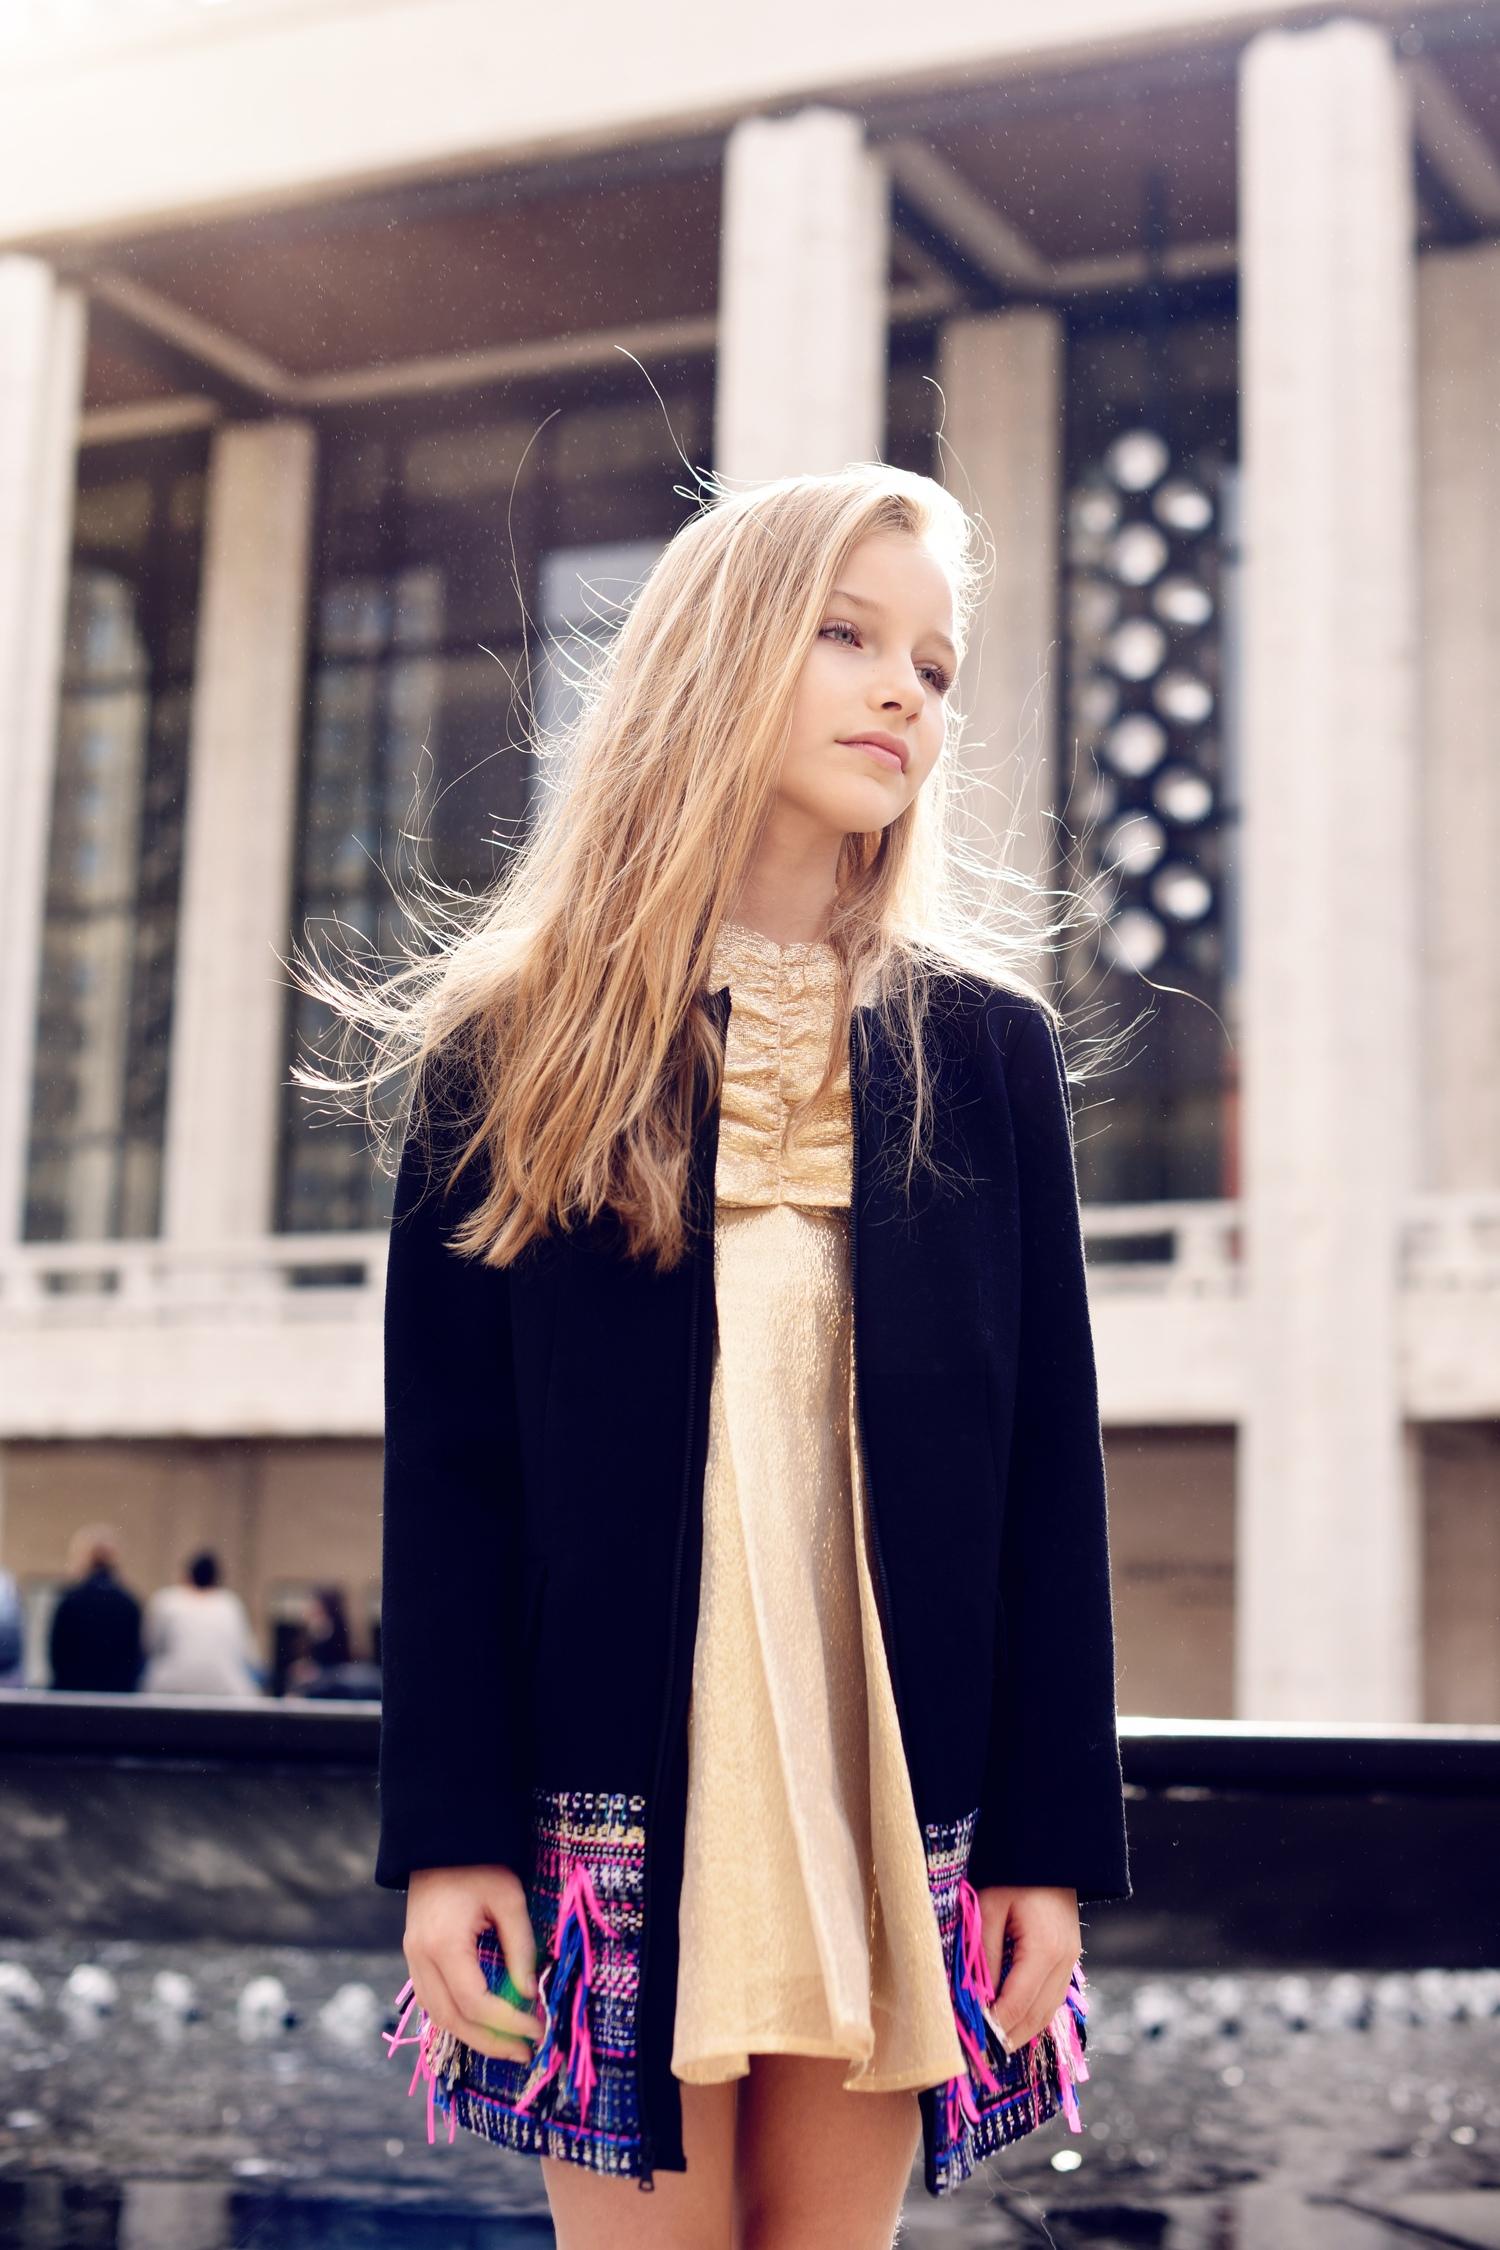 Enfant+Street+Style+by+Gina+Kim+Photography-12.jpeg